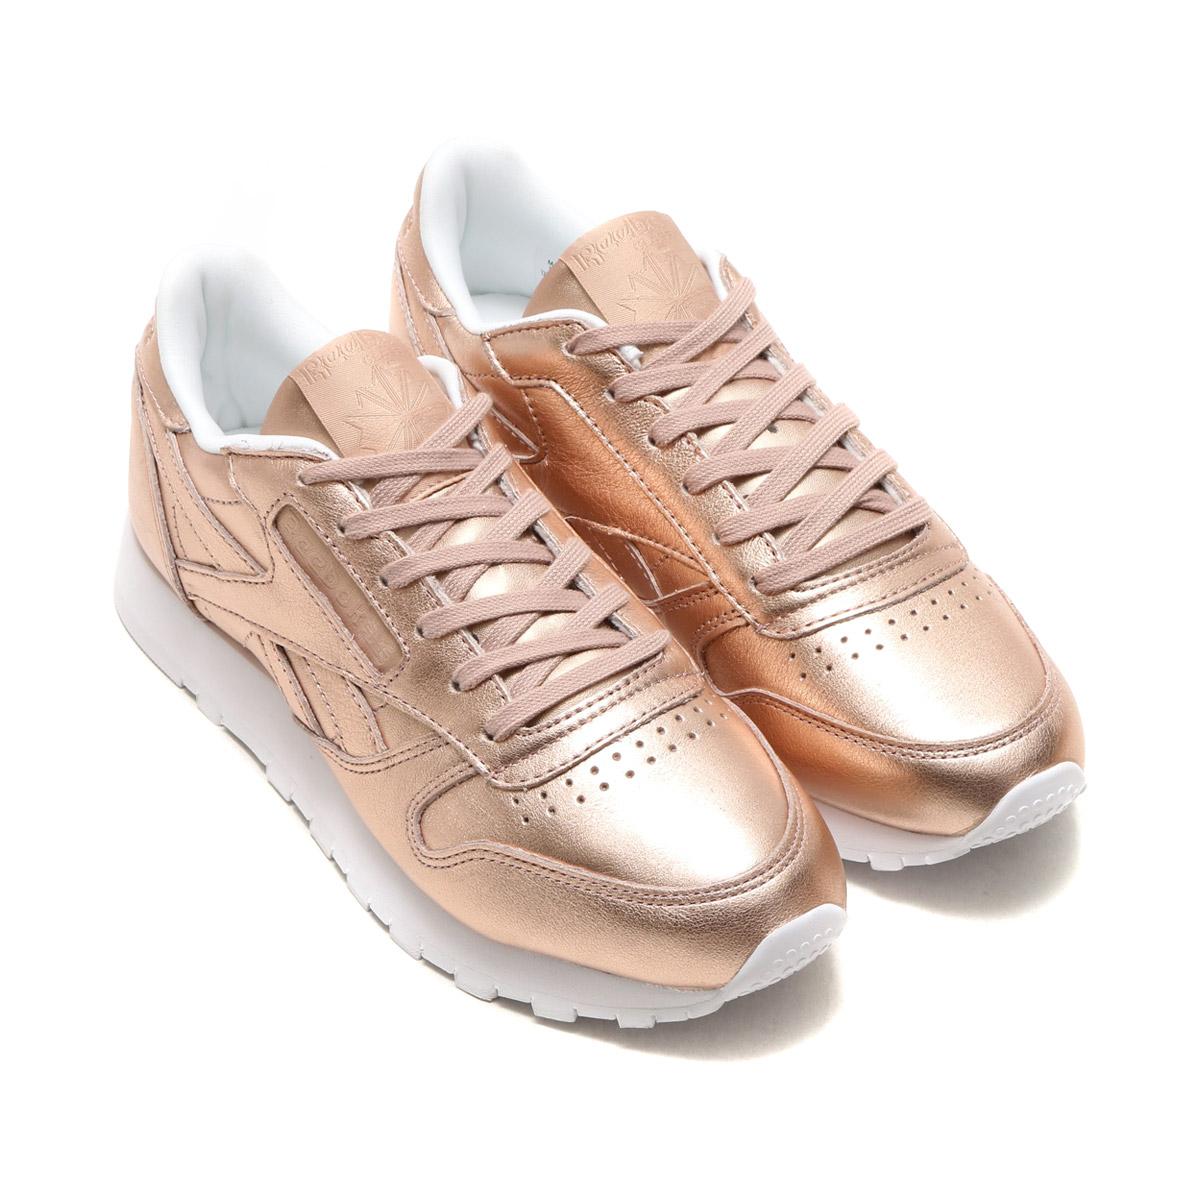 3c11d5c78bc Reebok CLASSIC (Reebok classical music) sneakers.